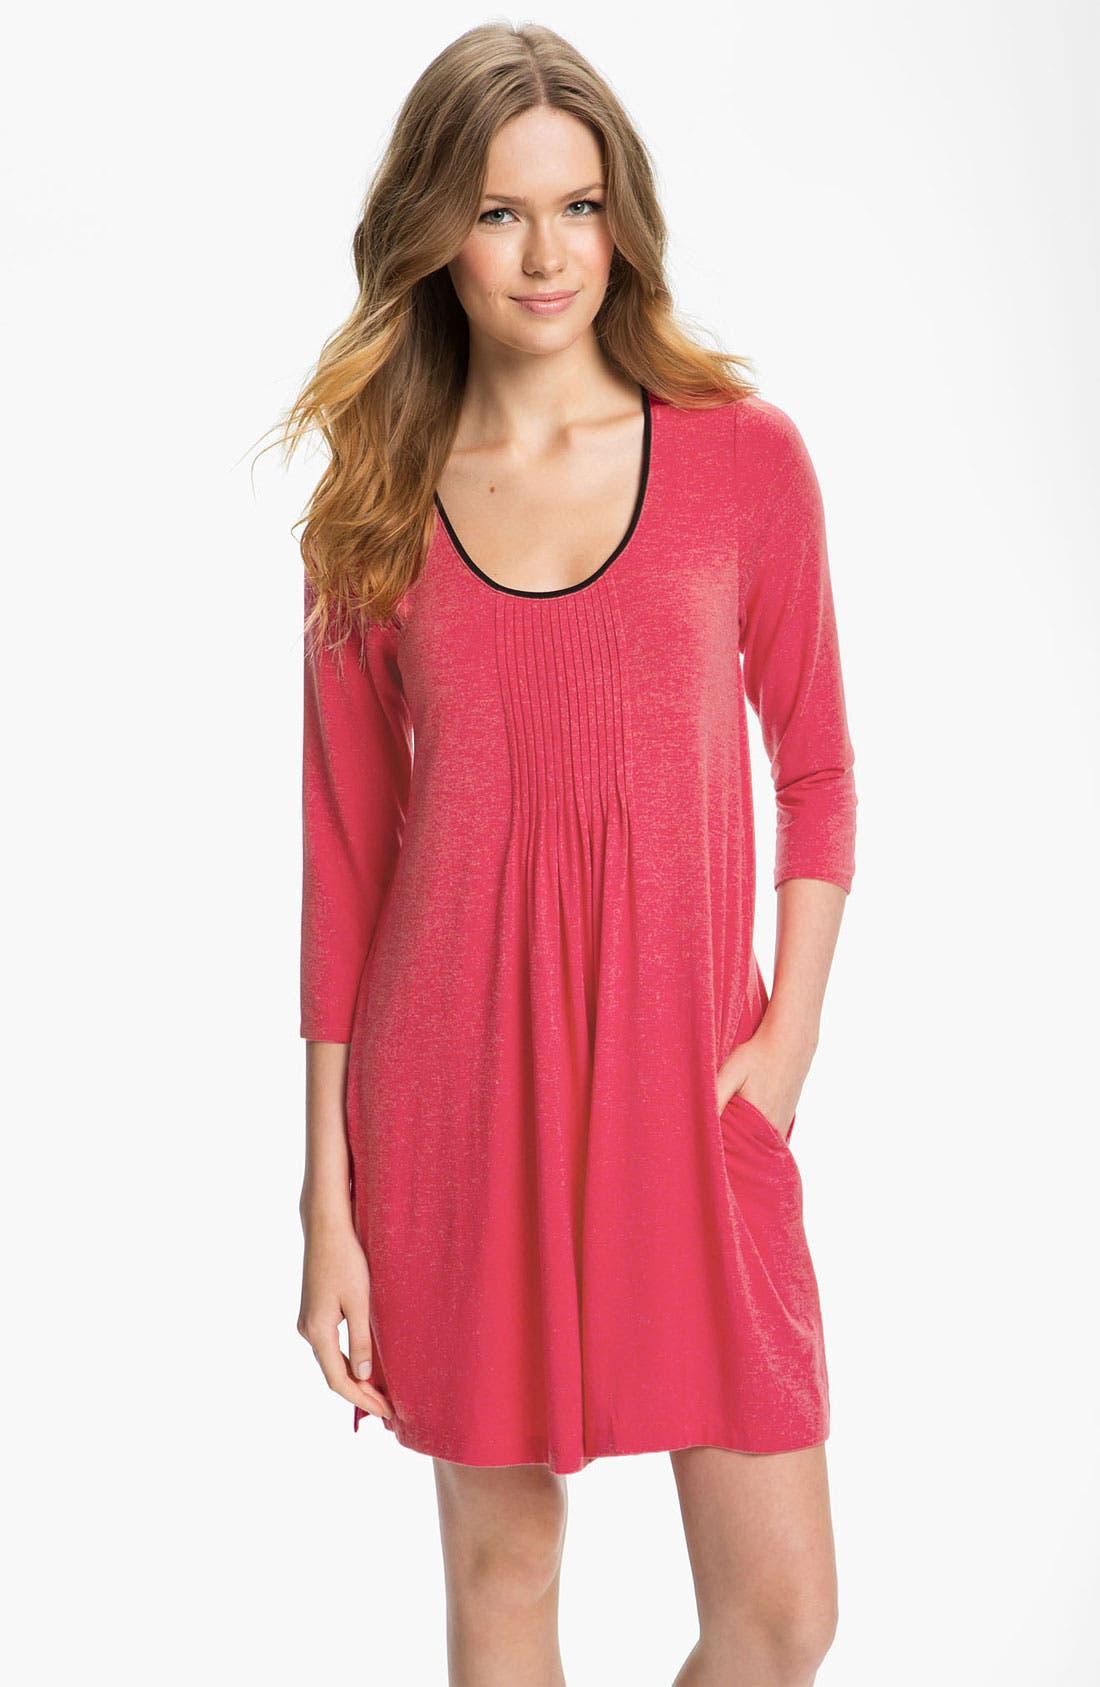 Alternate Image 1 Selected - DKNY '7 Easy Pieces' Pintuck Sleep Shirt